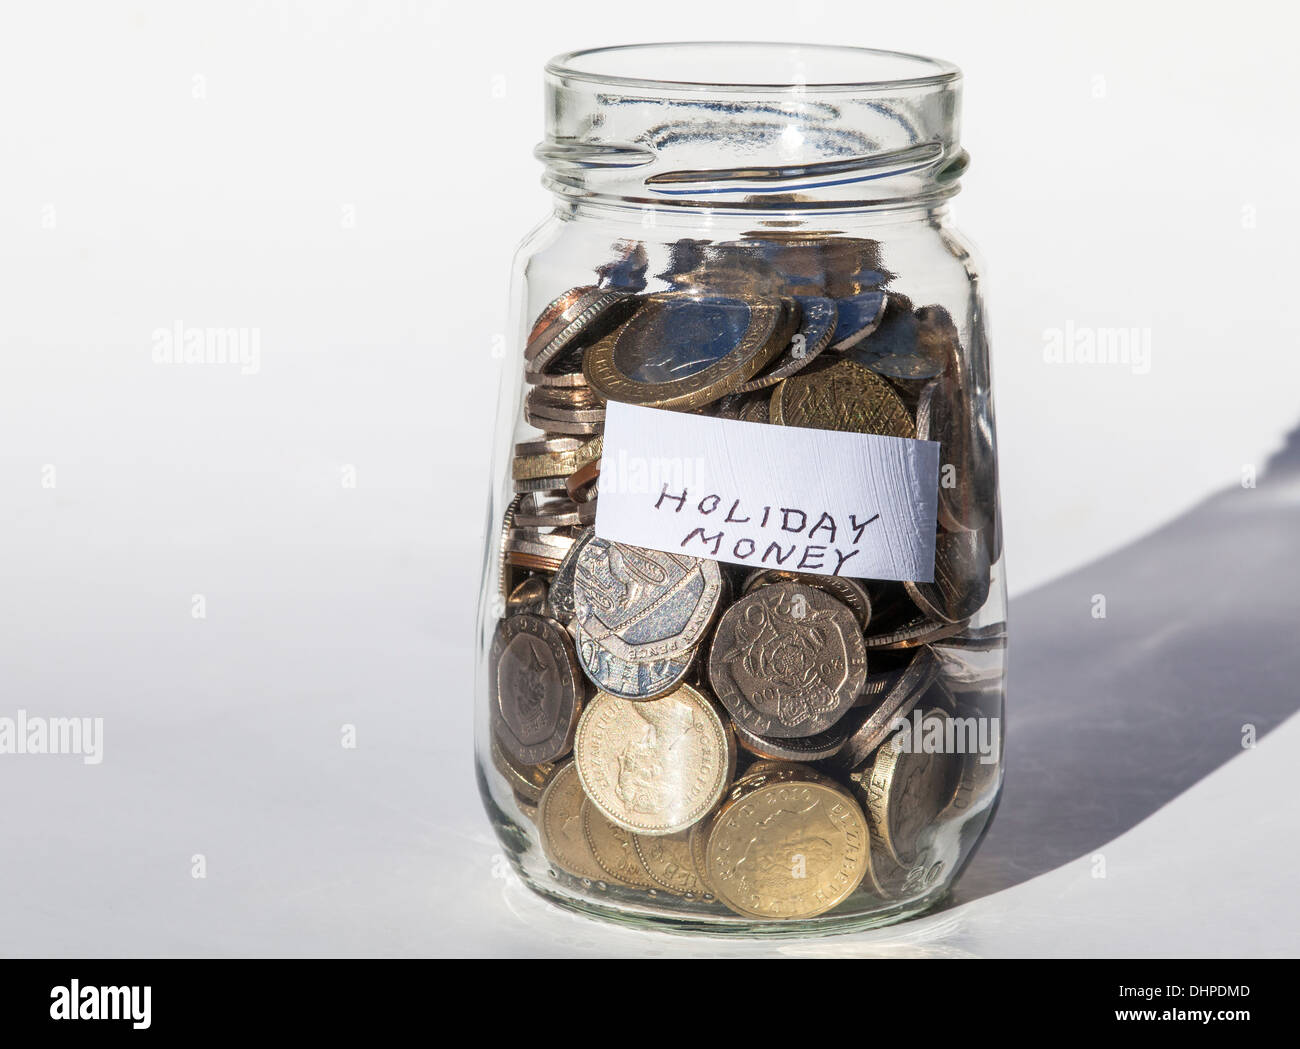 Holiday money savings - Stock Image